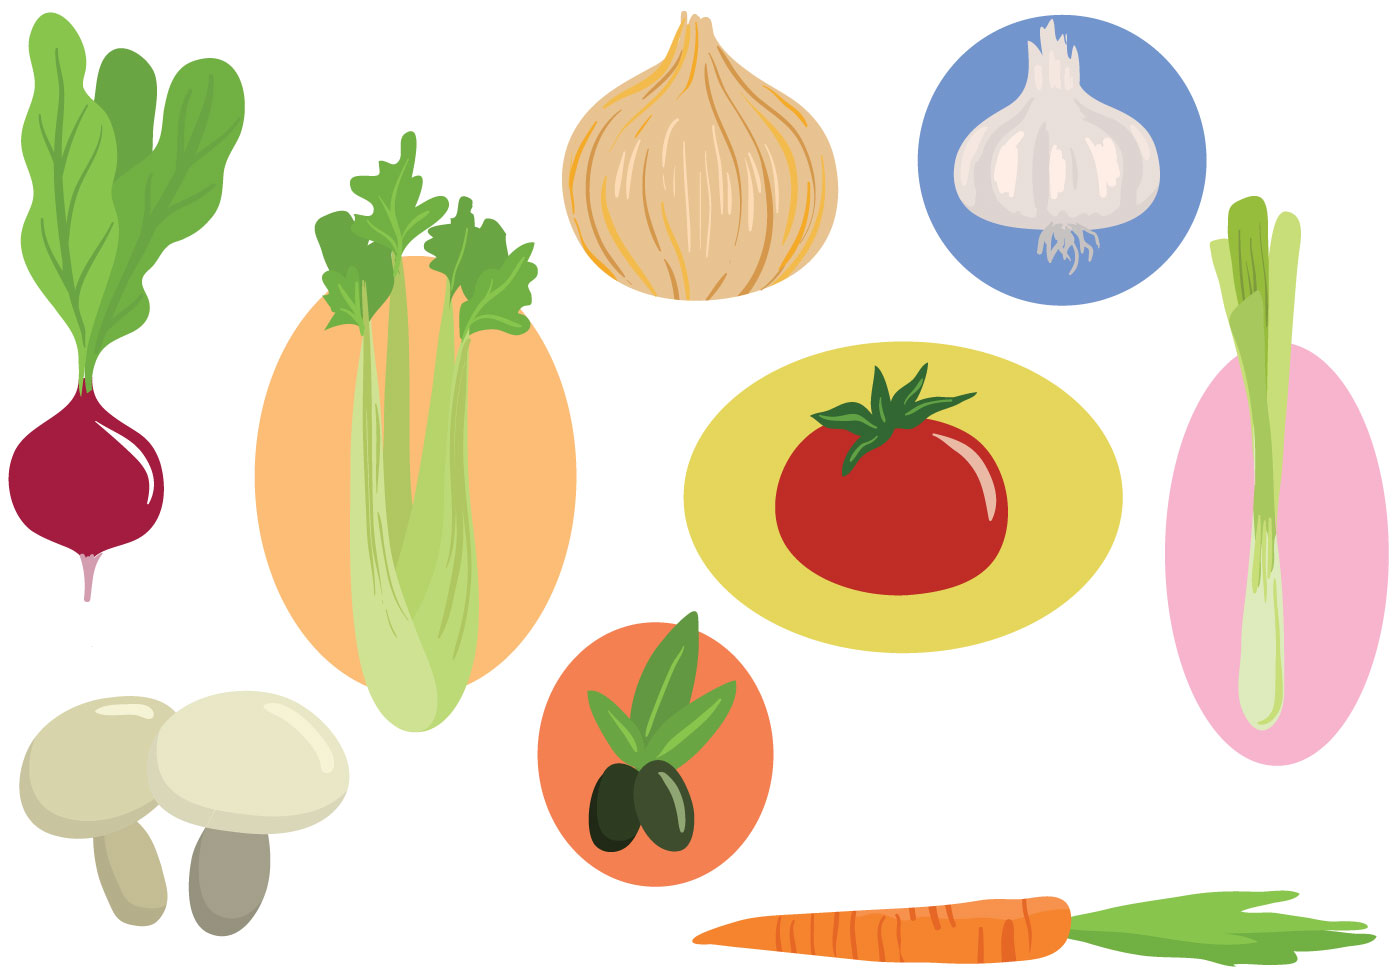 Free Vegetables Vectors - Download Free Vector Art, Stock ...